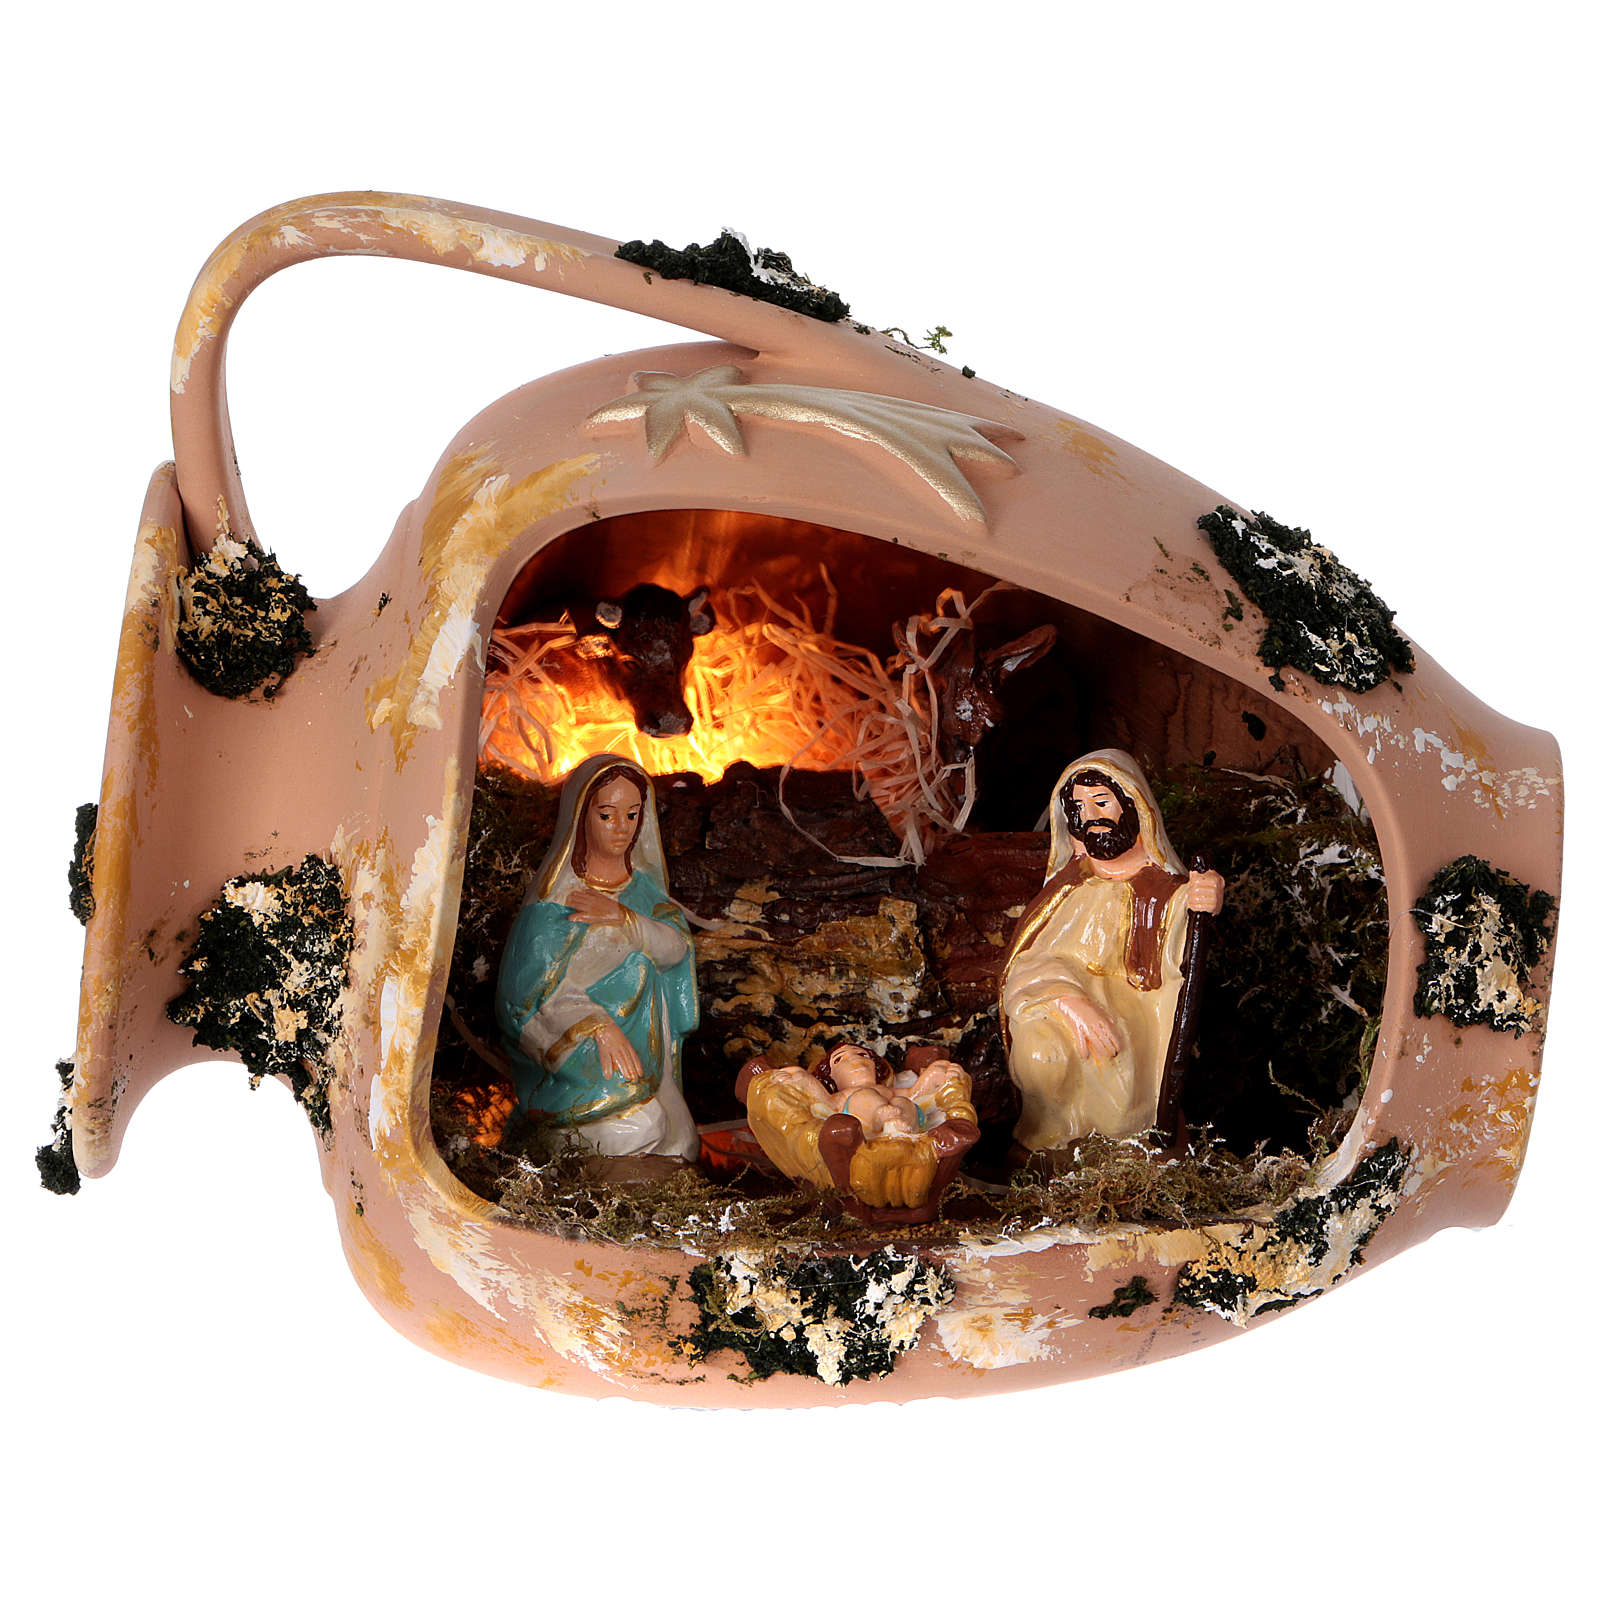 Ánfora tumbada con Natividad de terracota Deruta 4